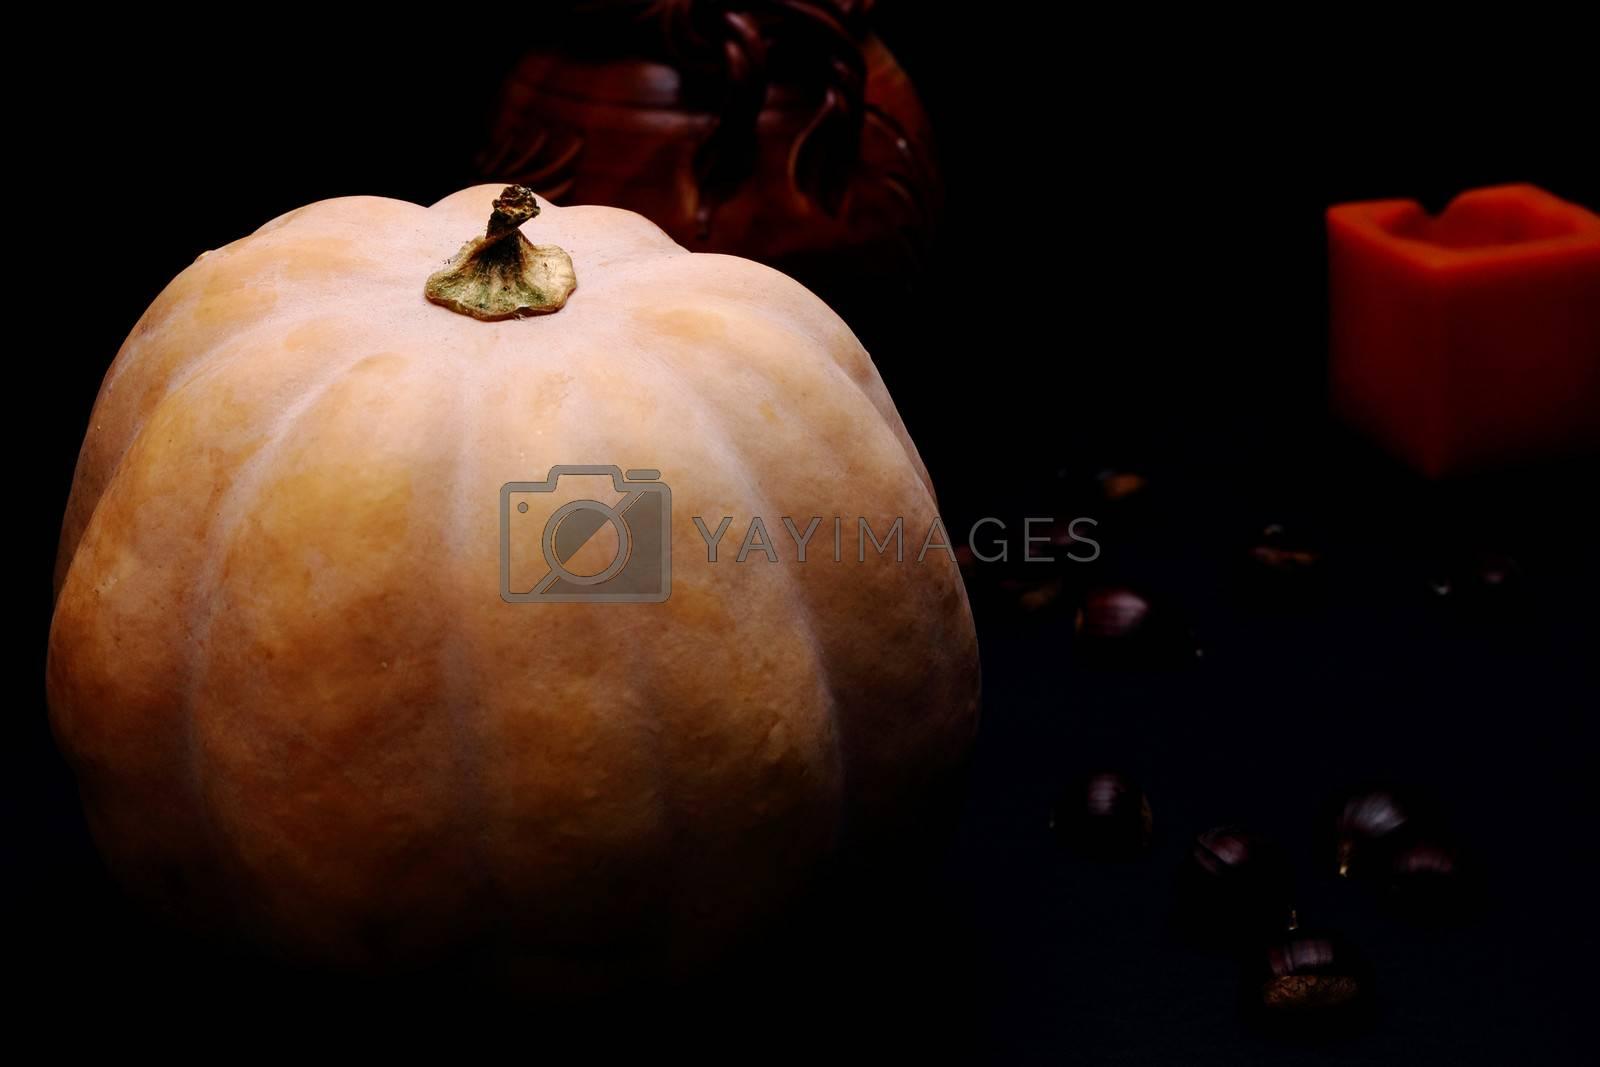 Pumpkin. Chestnuts and candle in background. Dark background